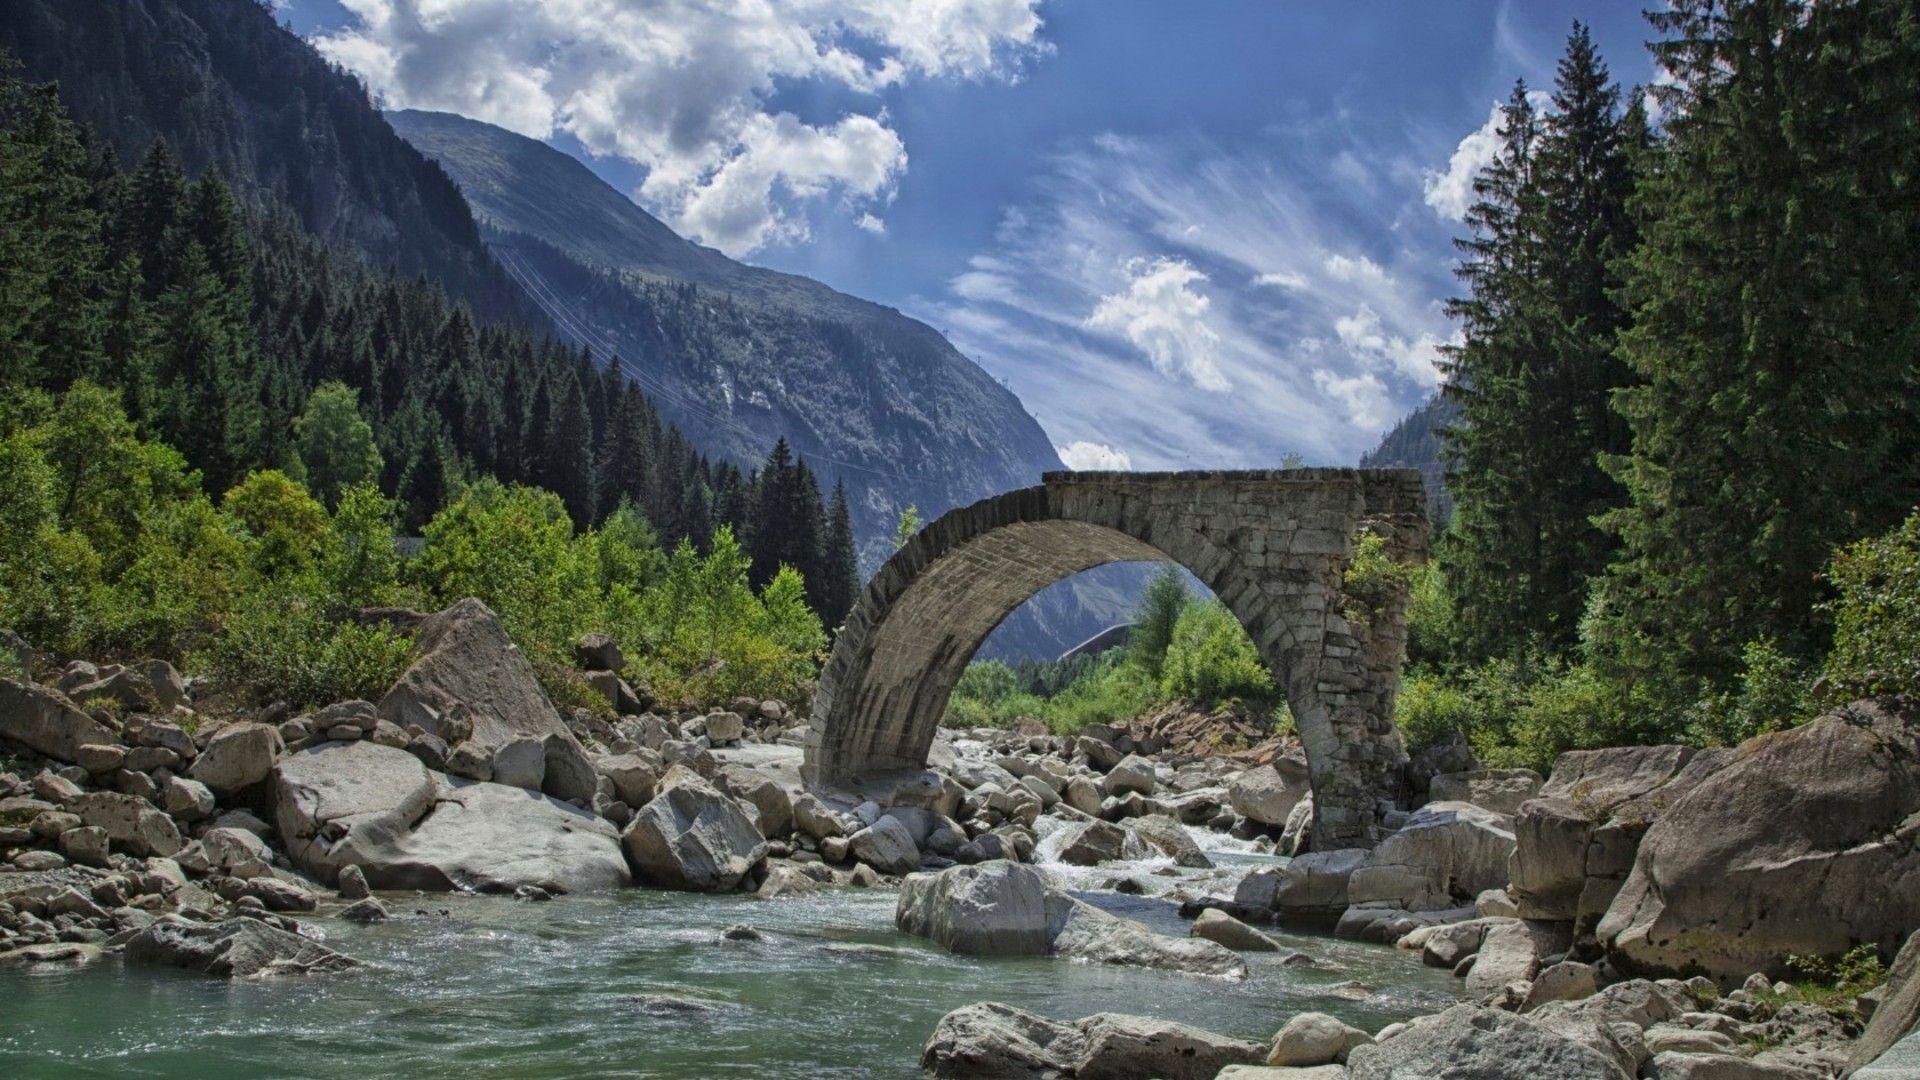 Hd wallpaper river - Bridge Ruins In A Rocky Valley River Hd